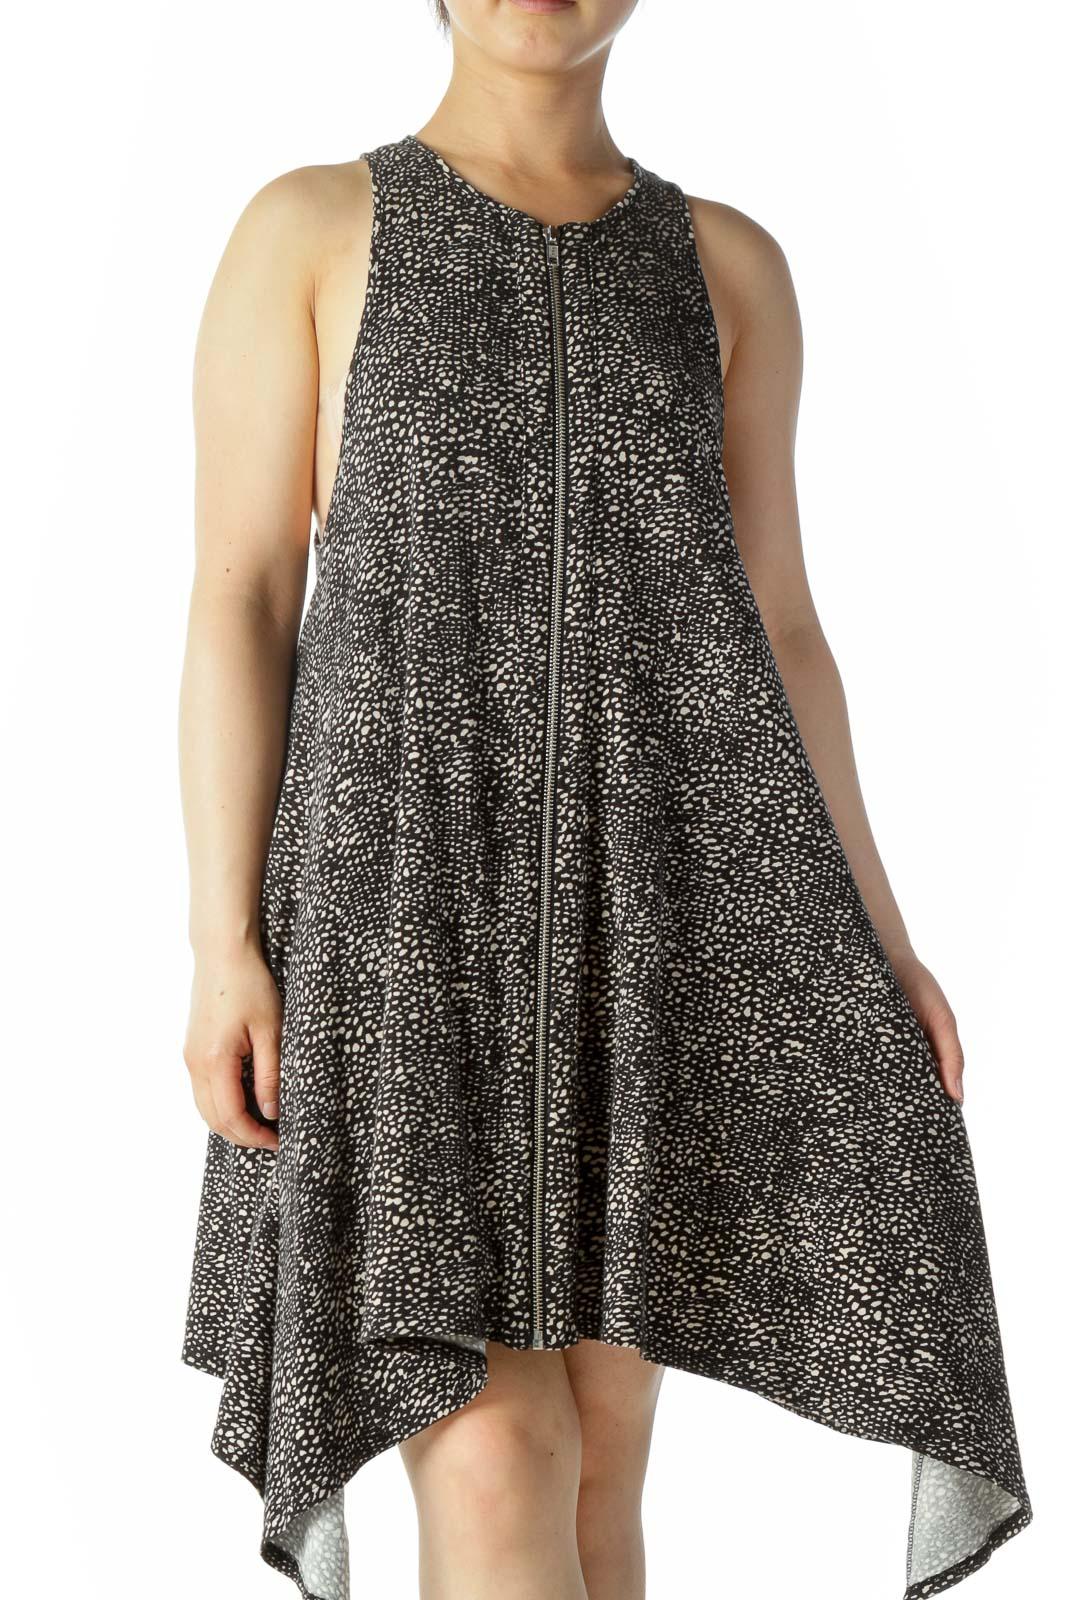 Black White Pattern Zip Up A line Dress Front